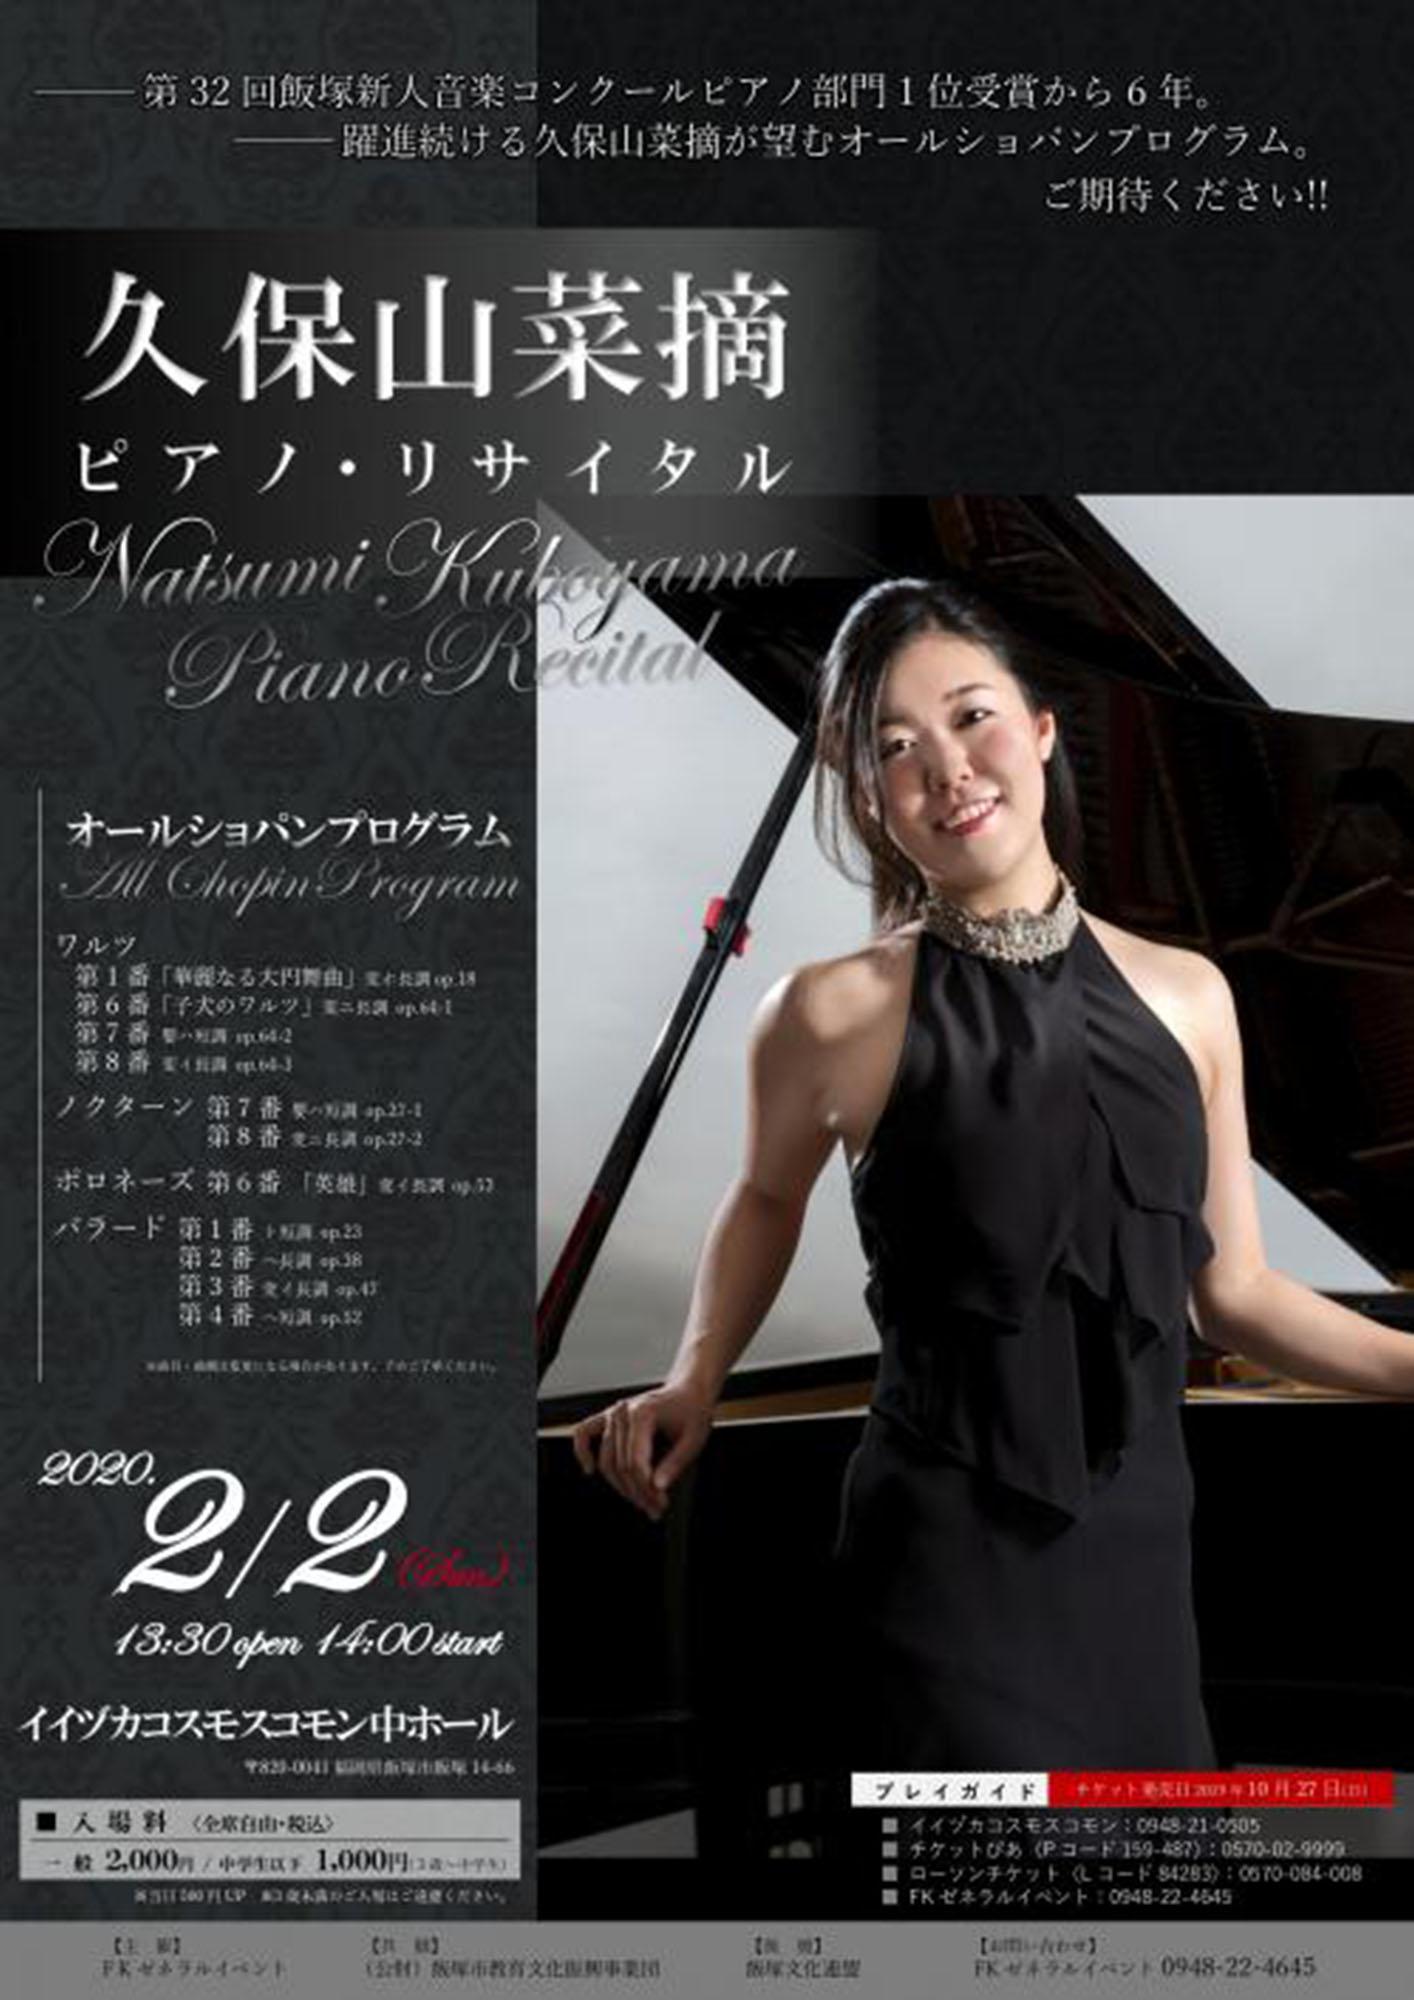 200202_kuboyama-natsumi_piano_ercital